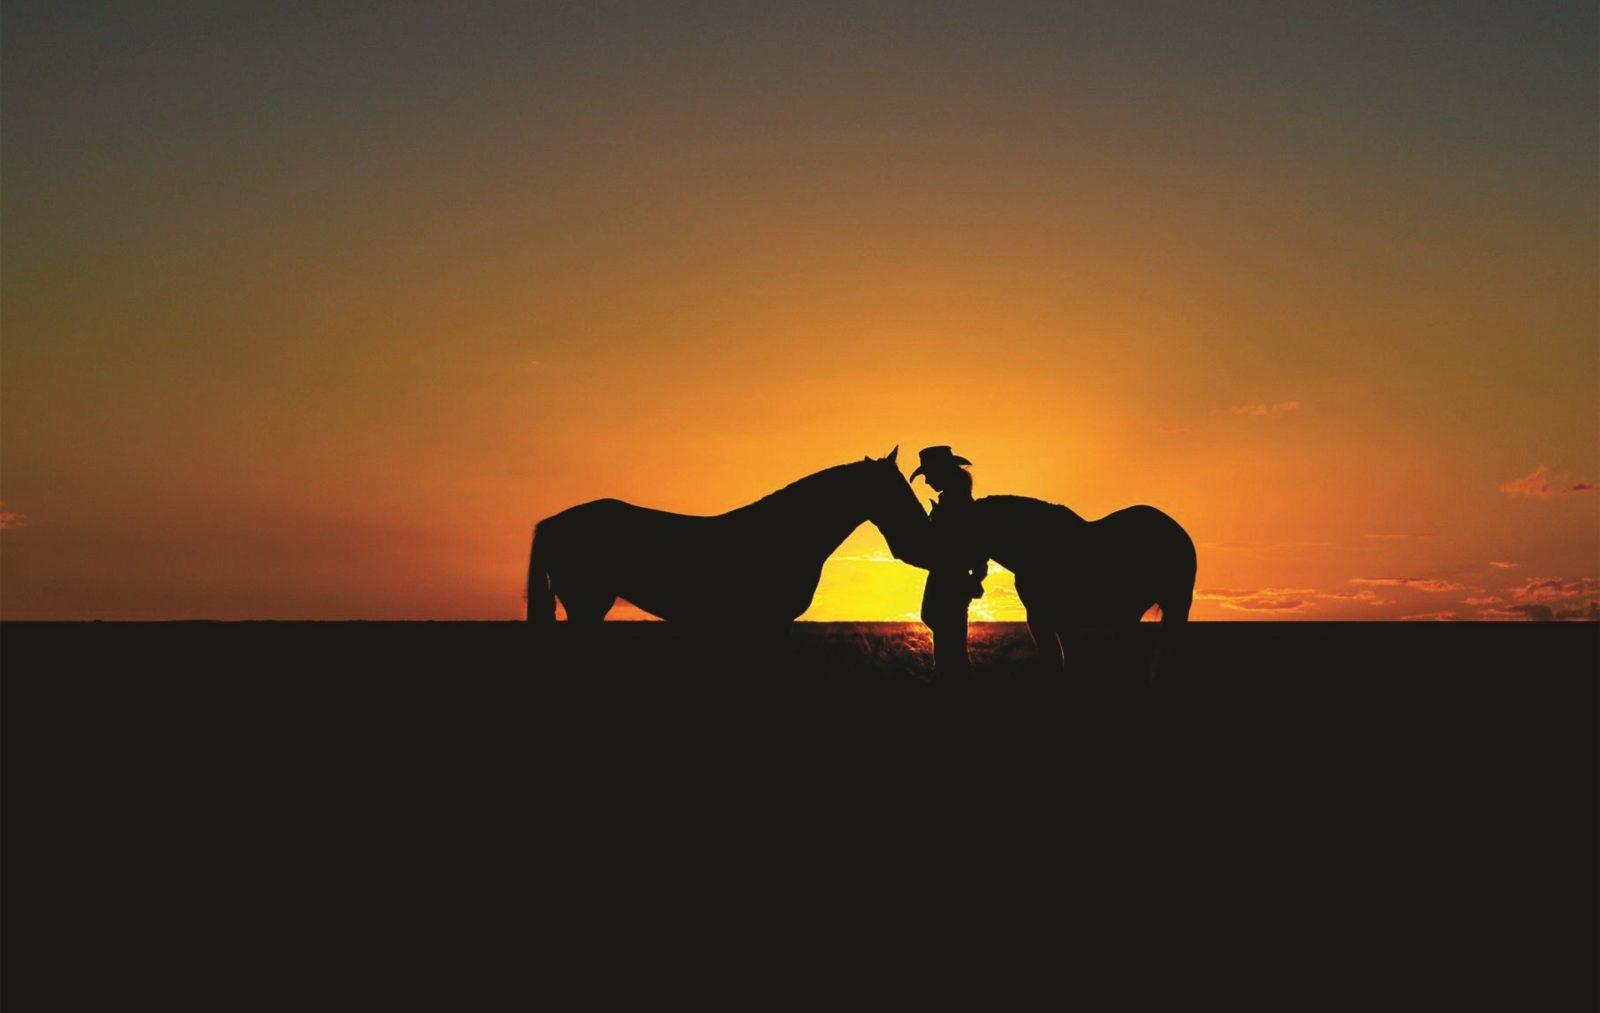 Horses in sunset near Dubbo